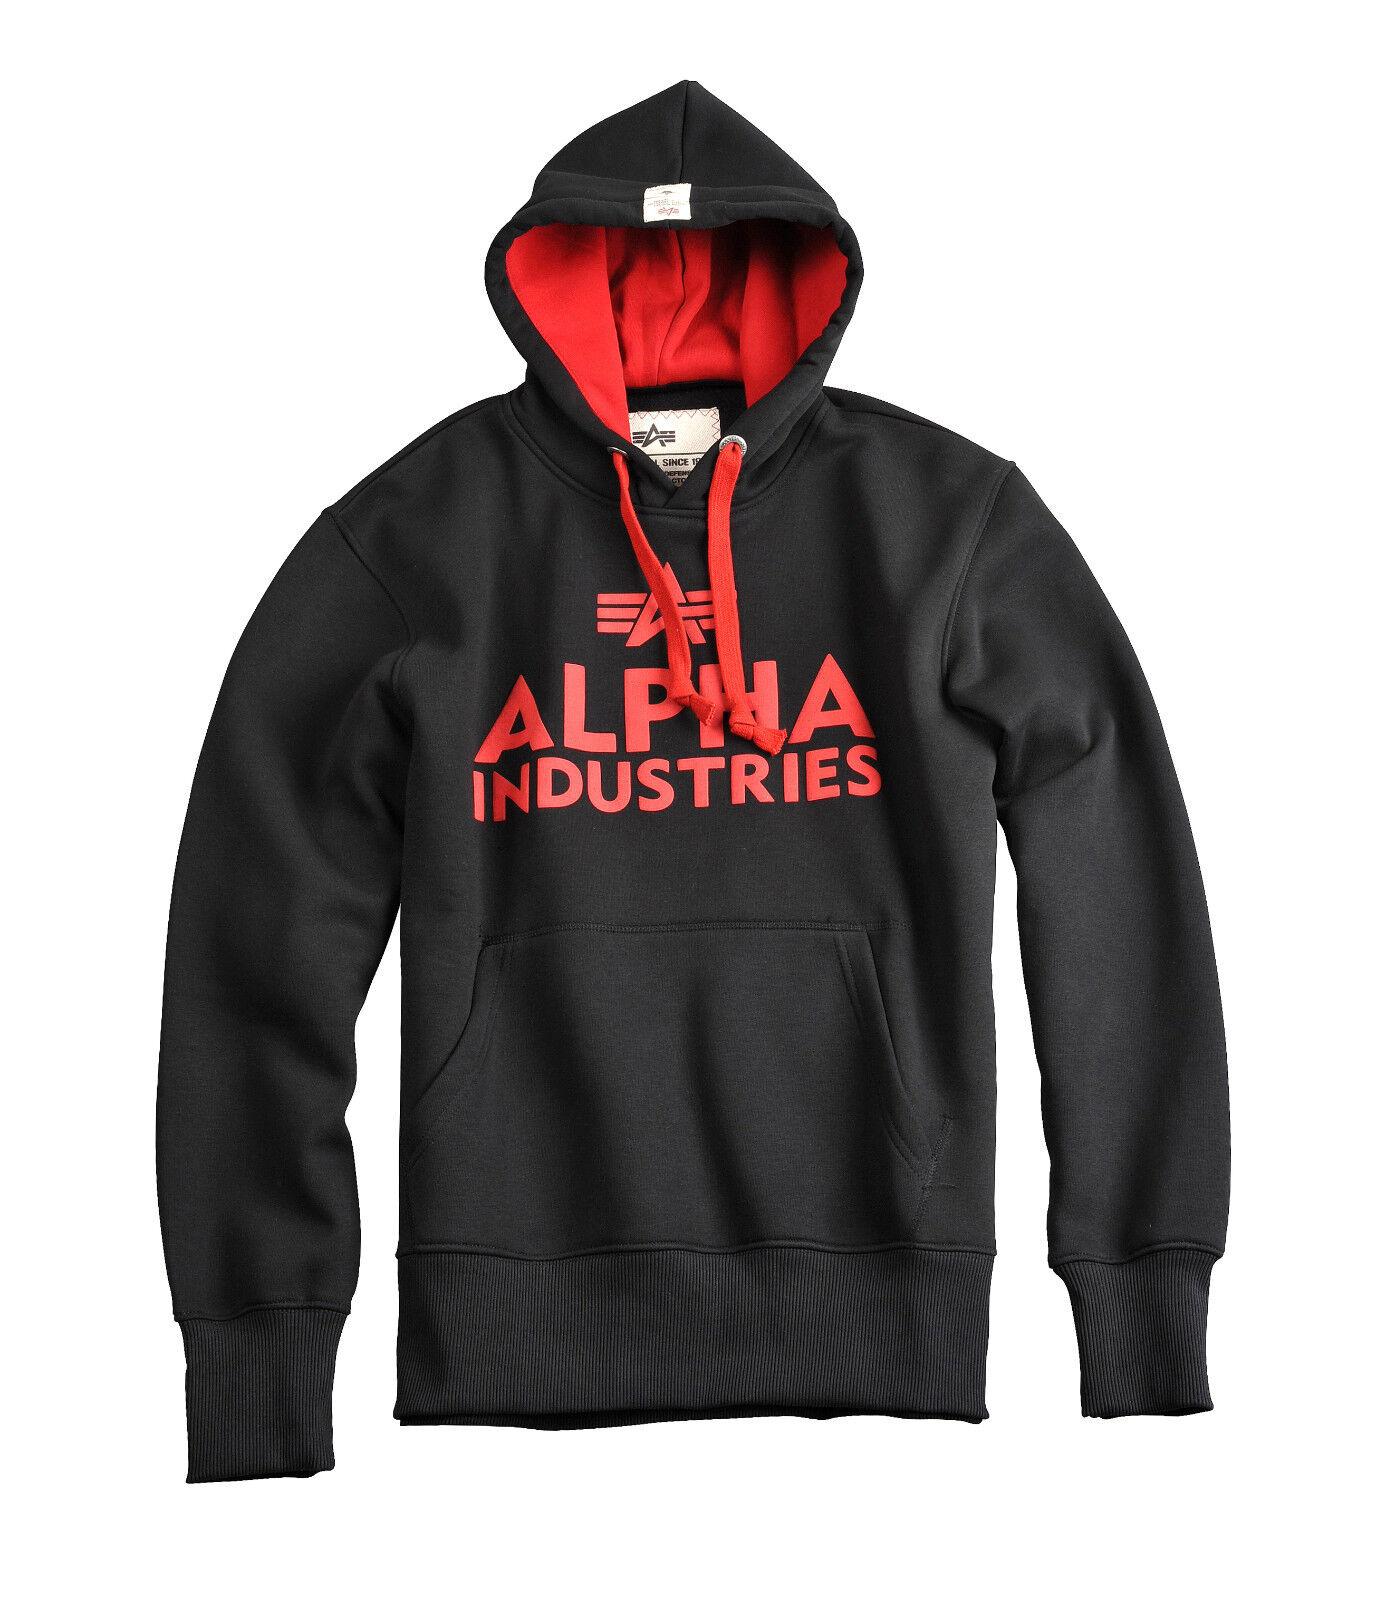 Alpha Alpha Alpha Industries Foam Print Hoody Pullover Uomo Training Felpa Cappuccio Rosso 1b5c28